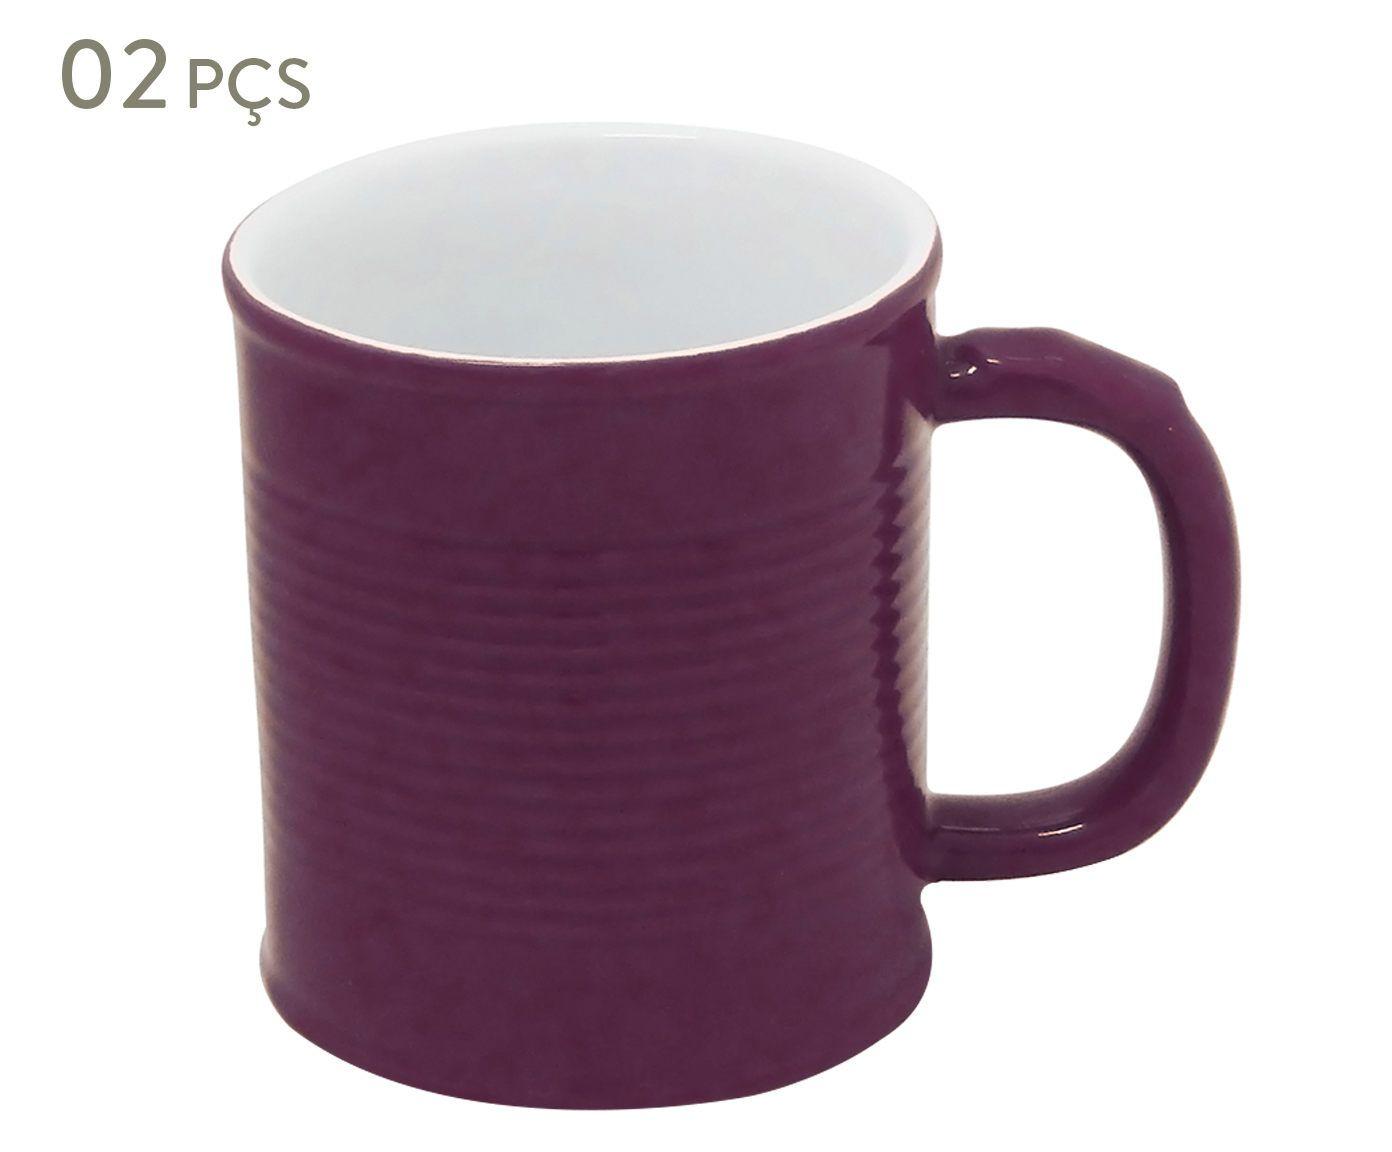 Conjunto de Canecas Espalier effect - 350 ml   Westwing.com.br